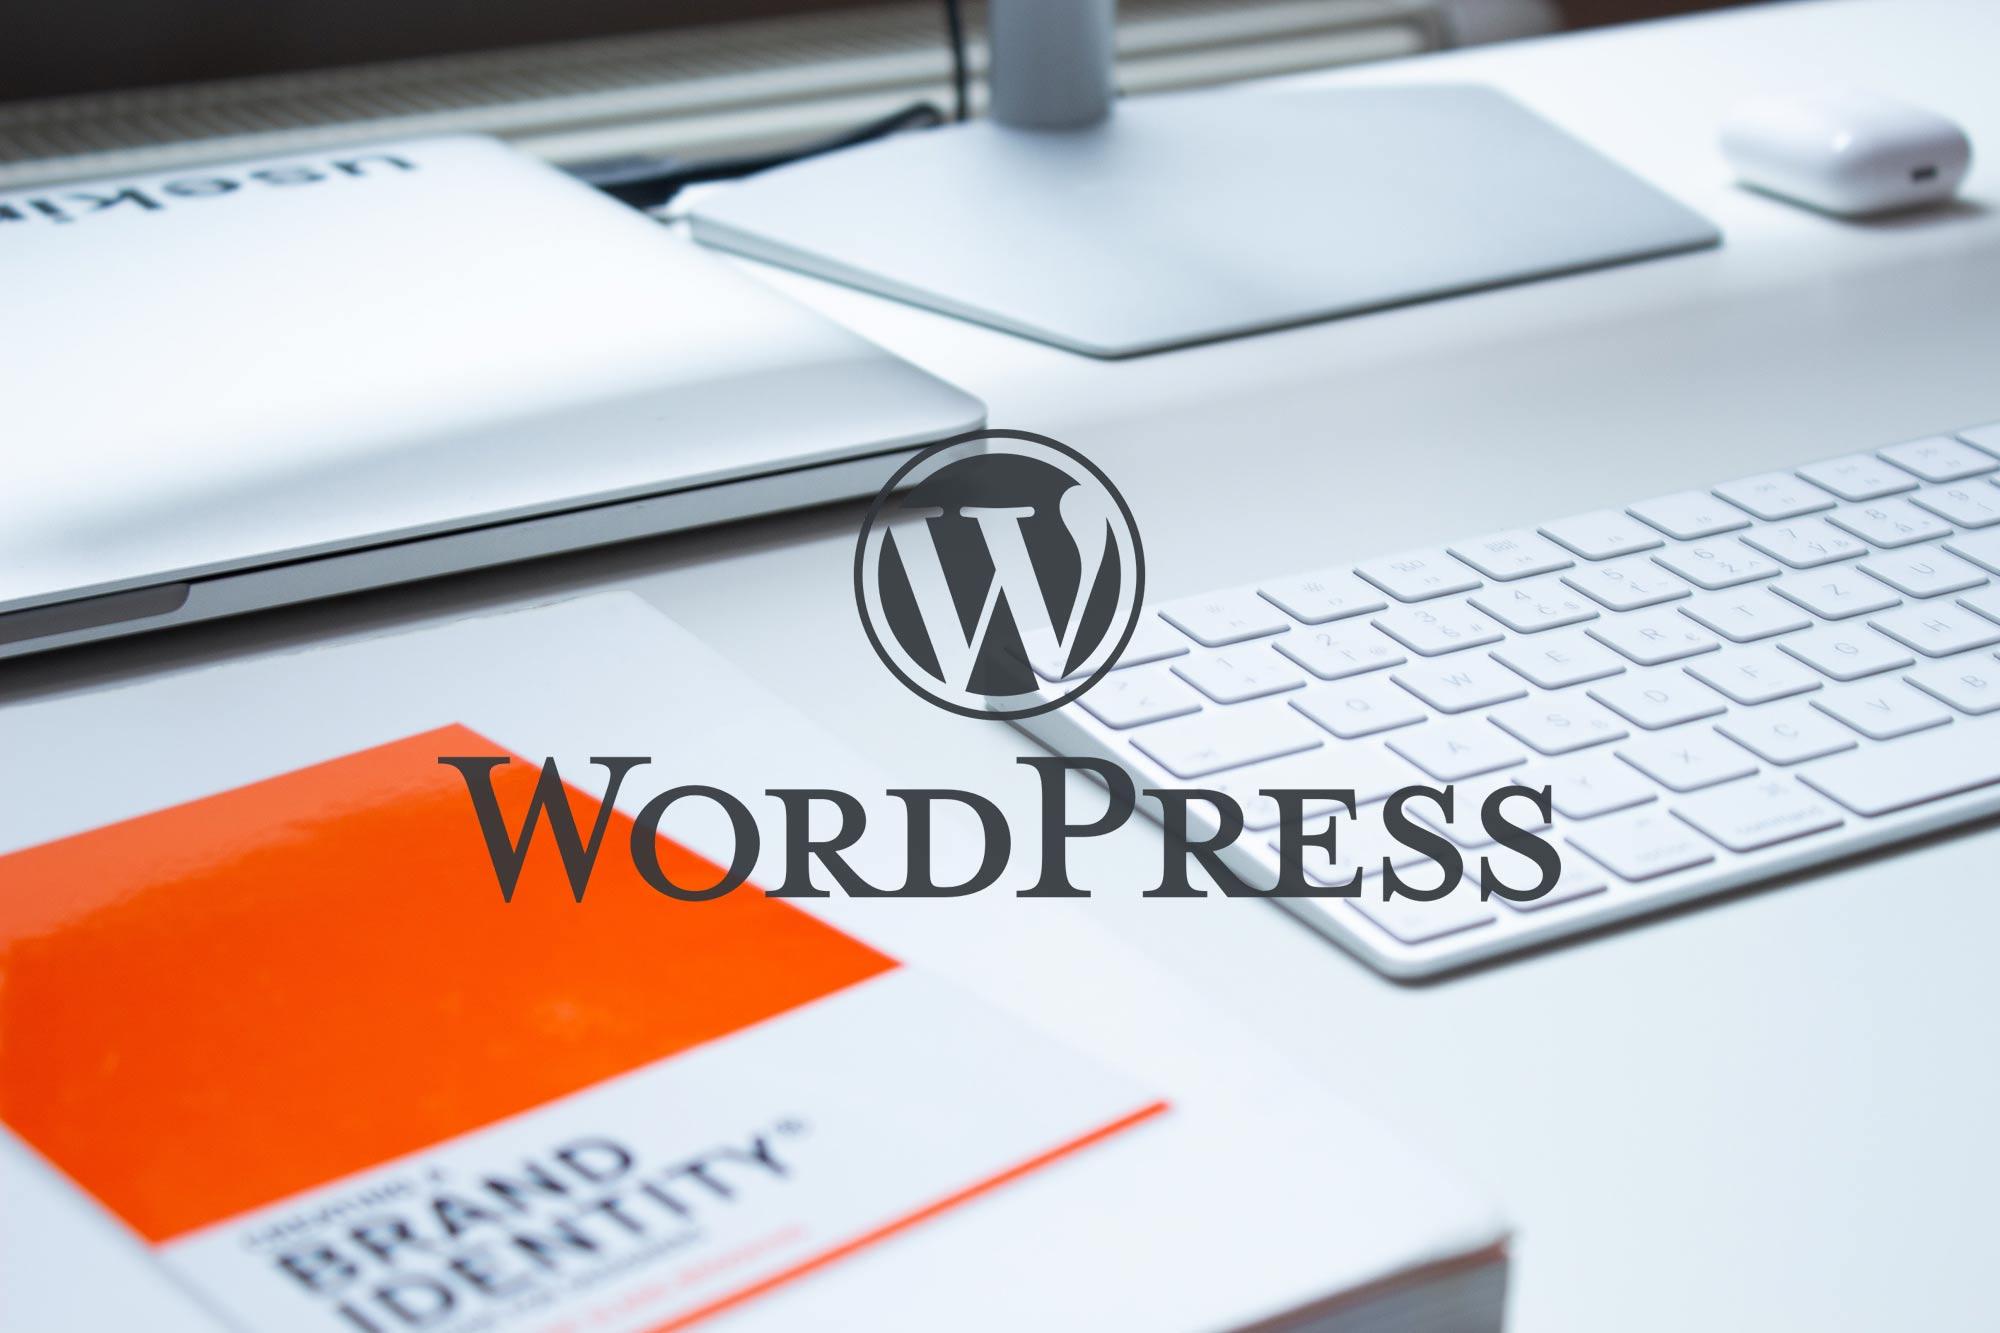 Wordpress是最主流的CMS內容管理網站系統-國際知名事業使用Wordpress建構網站的很多如:TechCrunch, The New Yorker, Beyonce, The Official Star Wars Blog, Microsoft News Center, BBC America, Vogue, Sony Music, Time Megazine, TED Blog, Microsoft News ...等。Wordpress 在CMS網頁設計的市場佔有率是60%;總網路網站佔有率33 (2019W3Techs),統計數字說明...台北網頁設計公司推薦-2.5D品牌顧問(品牌網站建置設計費用、收費、報價單洽詢)提供:SEO關鍵字優化、RWD響應式網頁設計、公司品牌網頁設計、公司形象網站製作、網路開店、購物網站設計、網頁設計作品集、ㄧ頁式網頁、網頁設計步驟、網頁設計範例、科技公司網頁設計、設計公司網頁設計、官網設計、餐廳網頁設計、工作室網頁設計、學校網頁設計、貿易網頁設計、外銷網頁設計、研究中心網頁設計、大學網頁設計、系所網頁設計、藝廊網頁設計。客戶觸及桃園,新竹,台中,台南,高雄與北台灣-歡迎您聯繫。